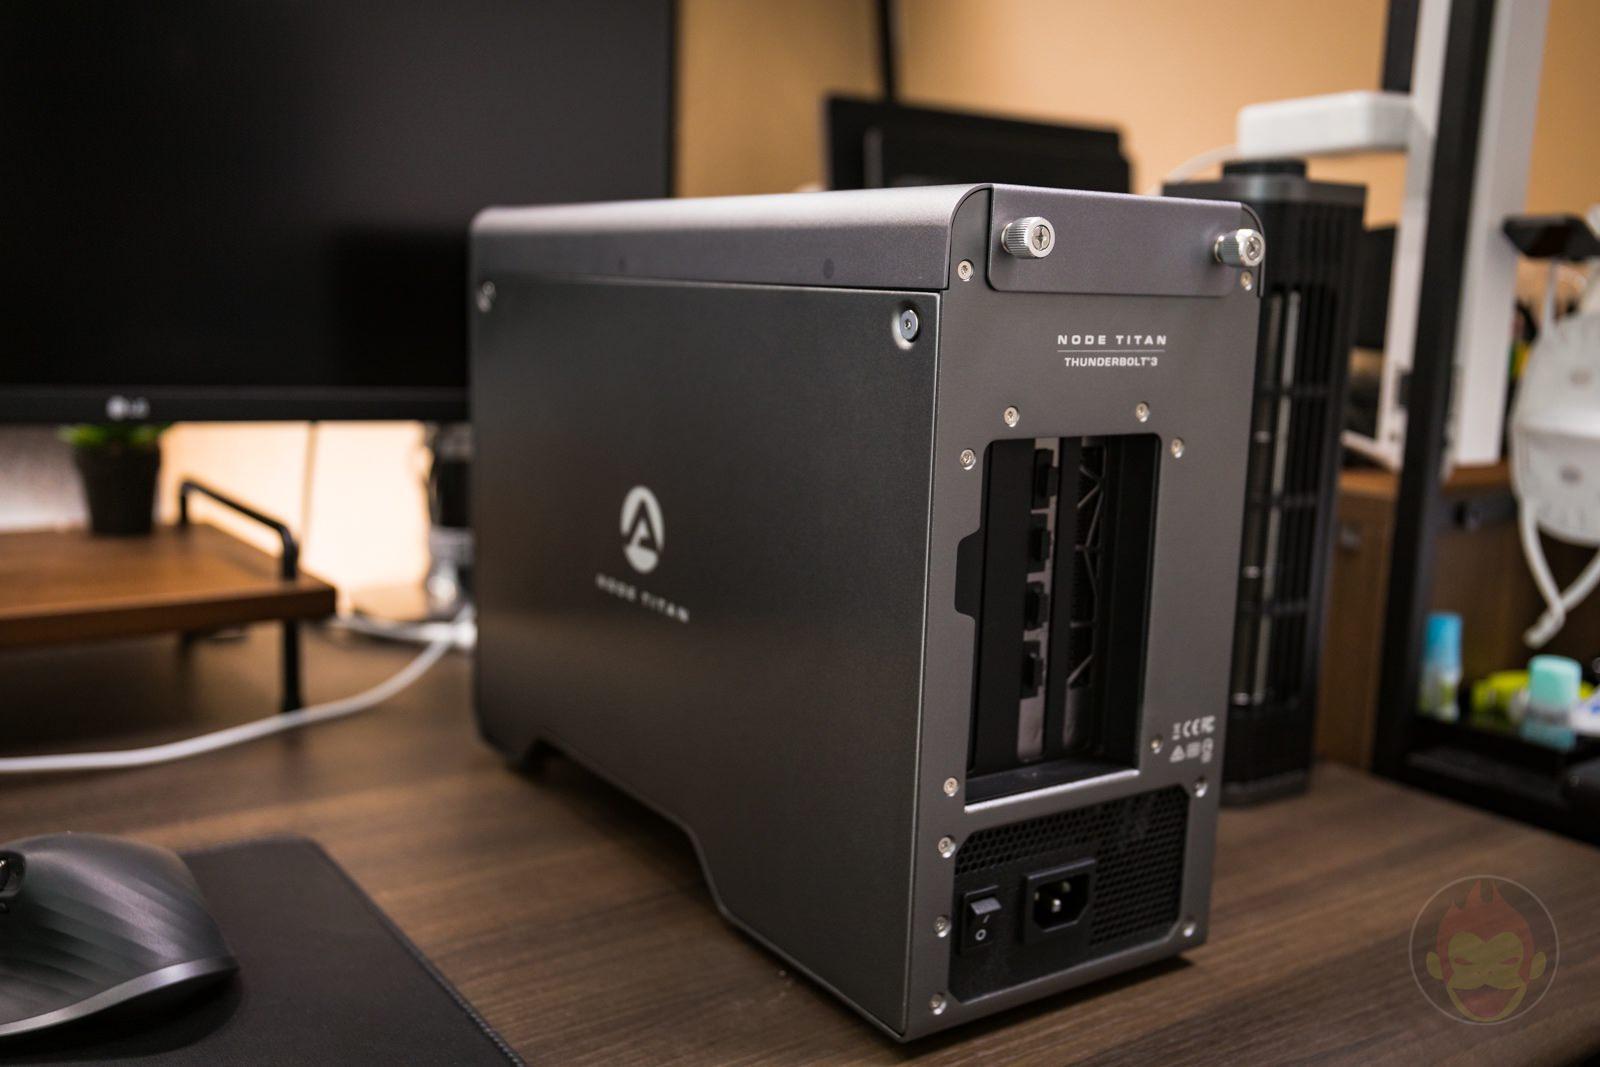 AKiTiO Node Titan with msi AMD Radeon RX 5700 XT Review 27